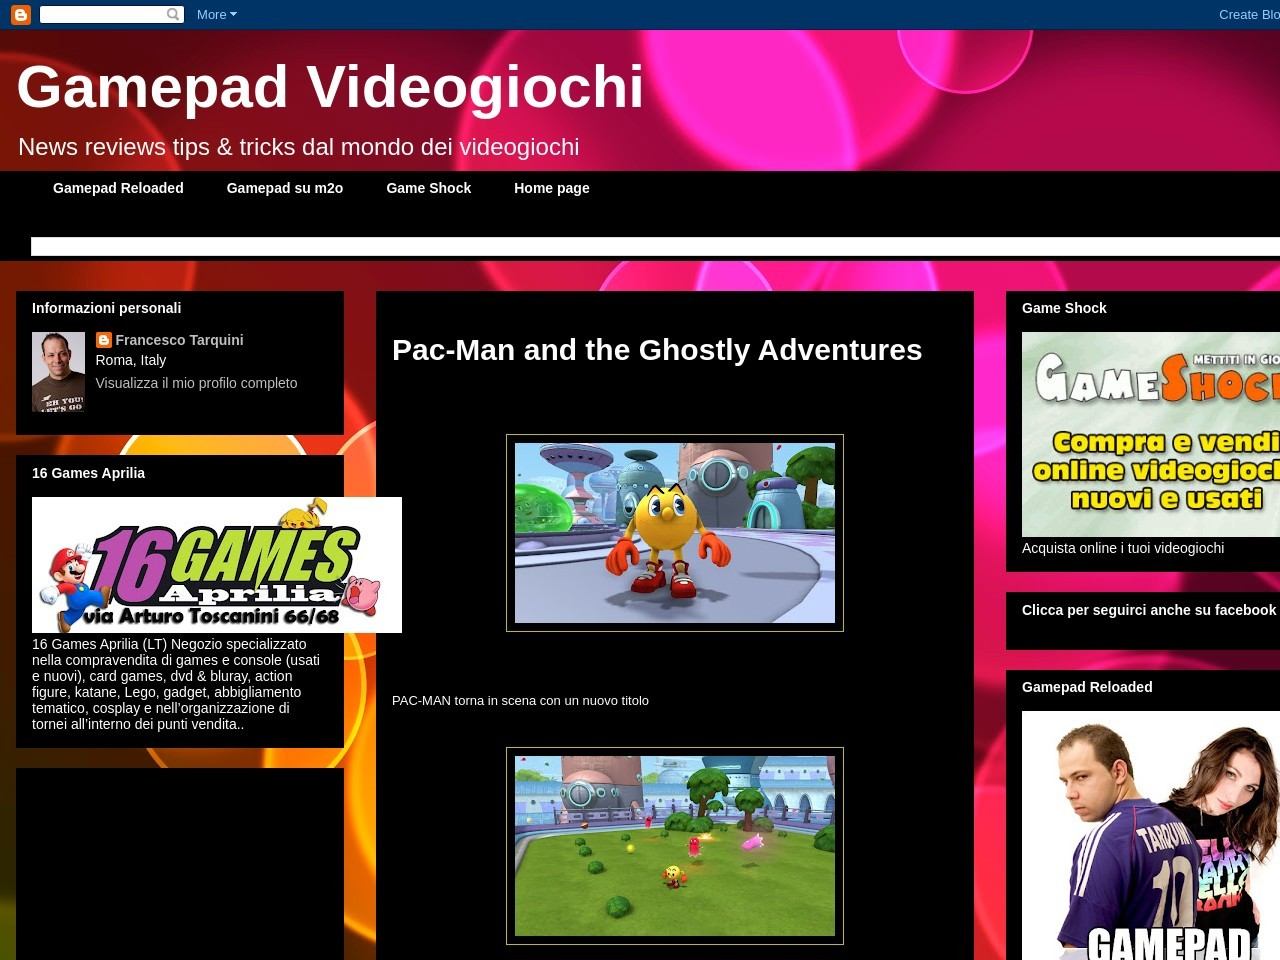 videogiochi-gamepad